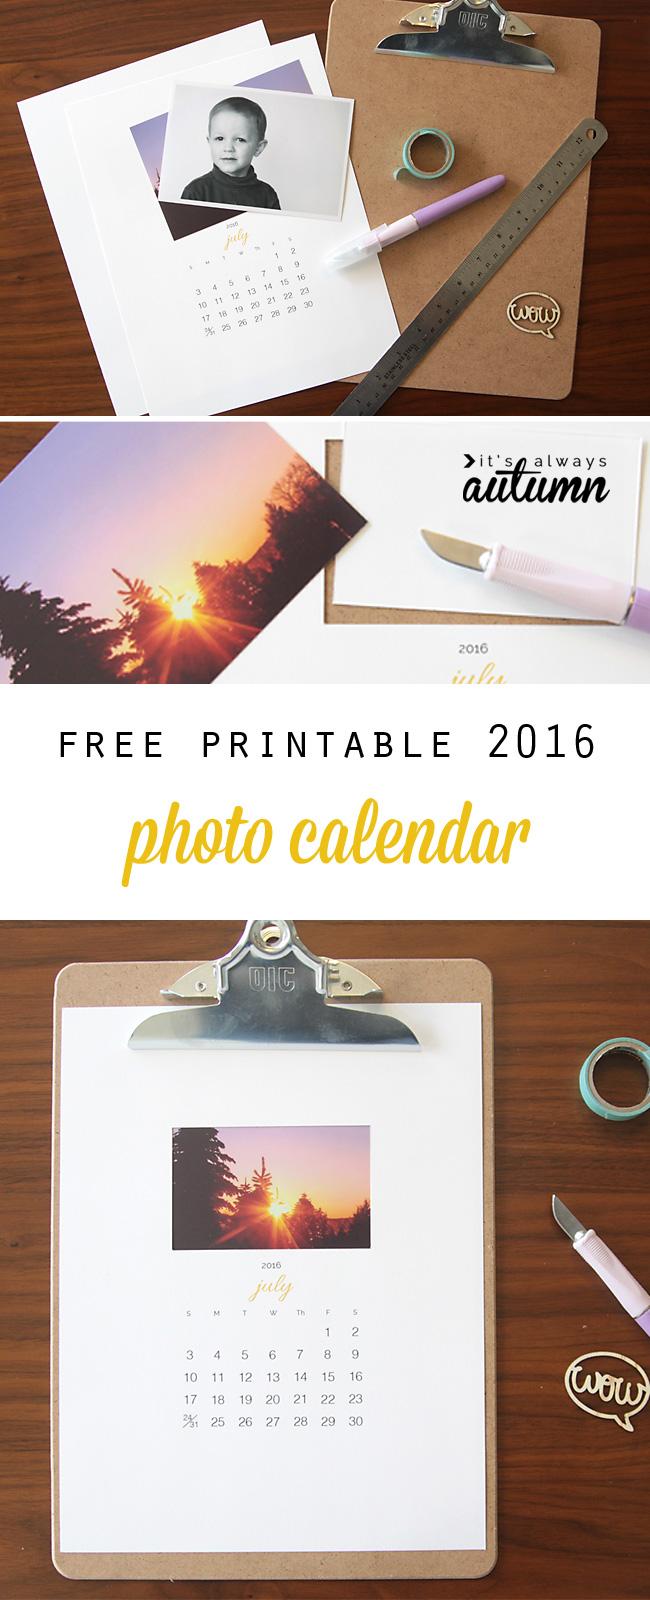 Free printable calendar with photos added